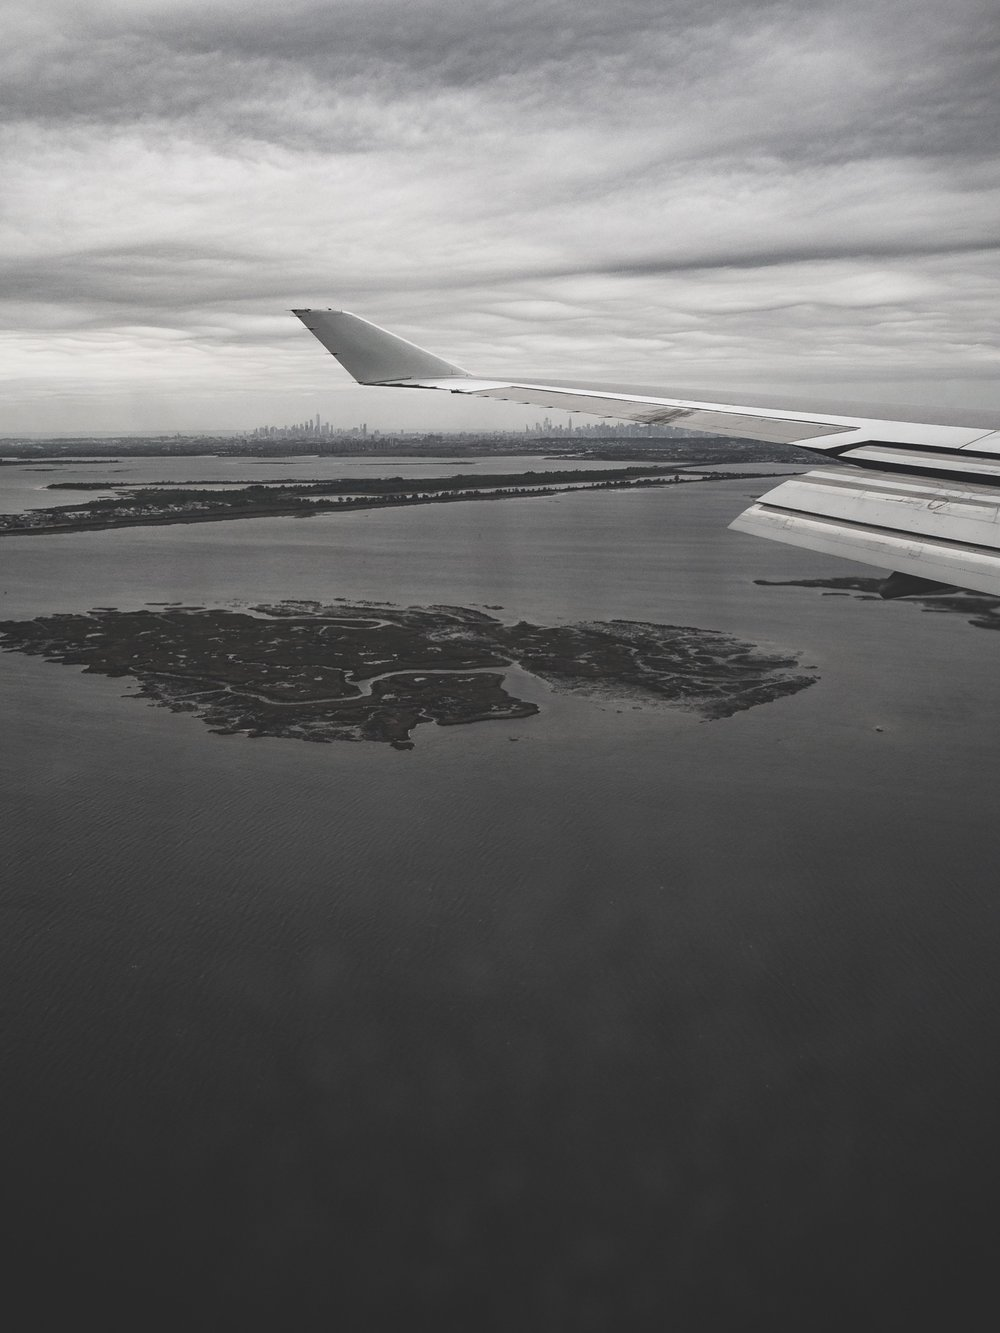 Descent into New York JFK